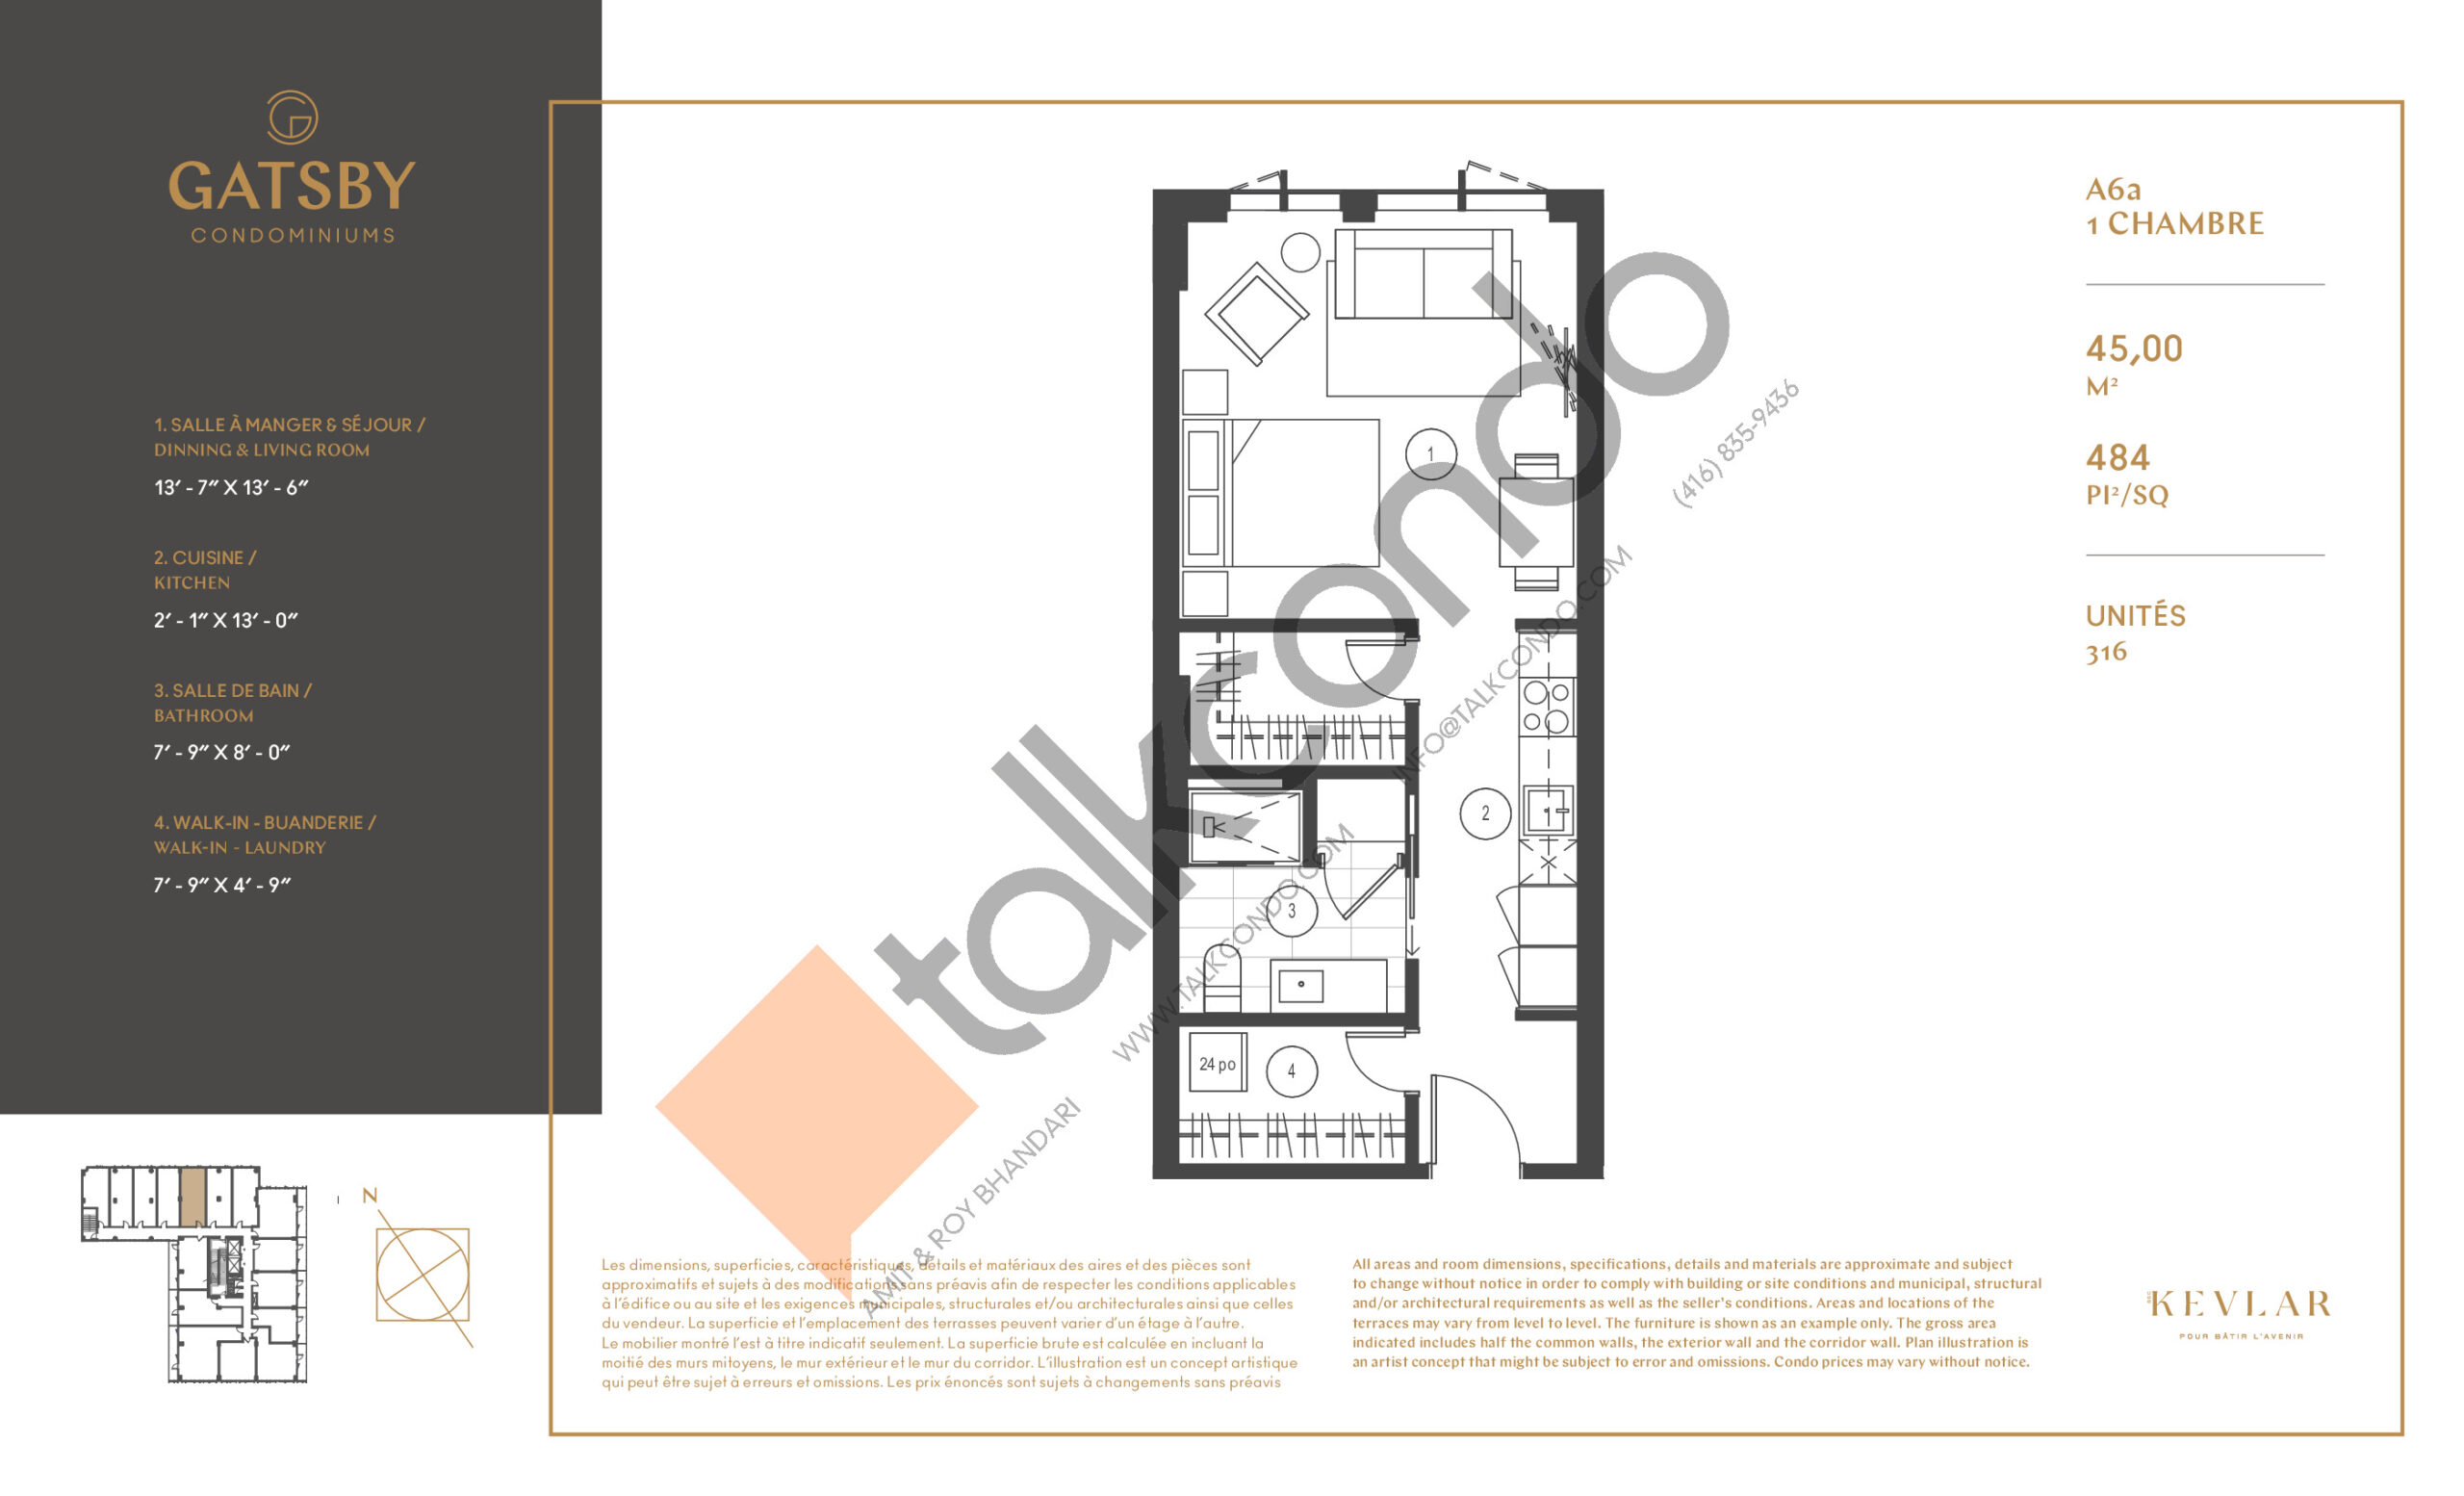 A6a Floor Plan at Gatsby Condos - 484 sq.ft